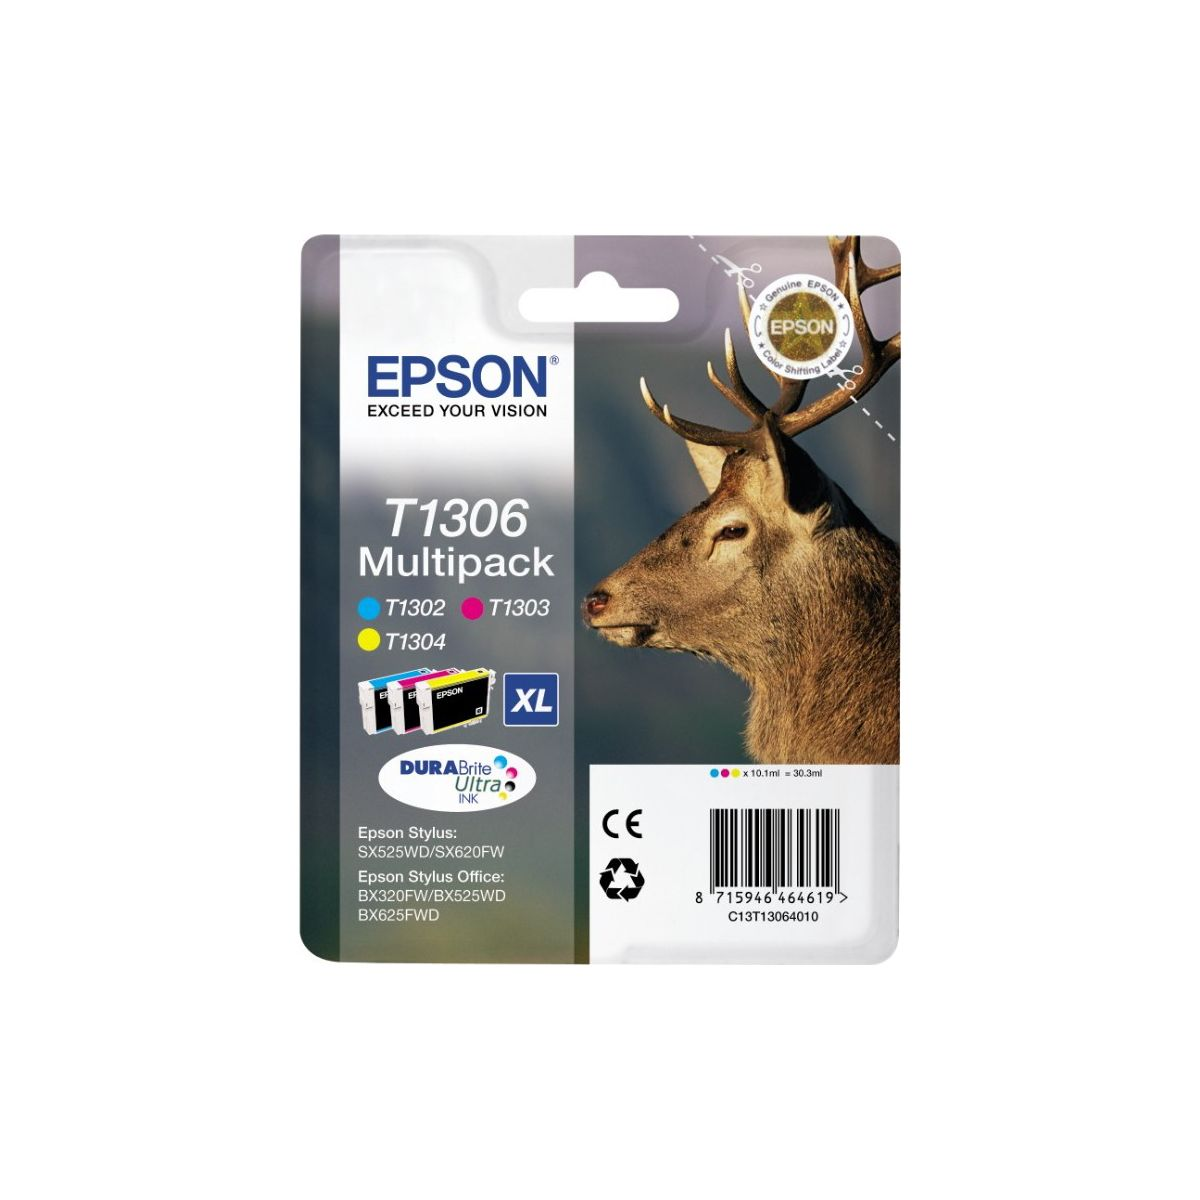 Multipack cartouches d'encre EPSON T130 (Cyan Magenta Jaune) Série Cerf